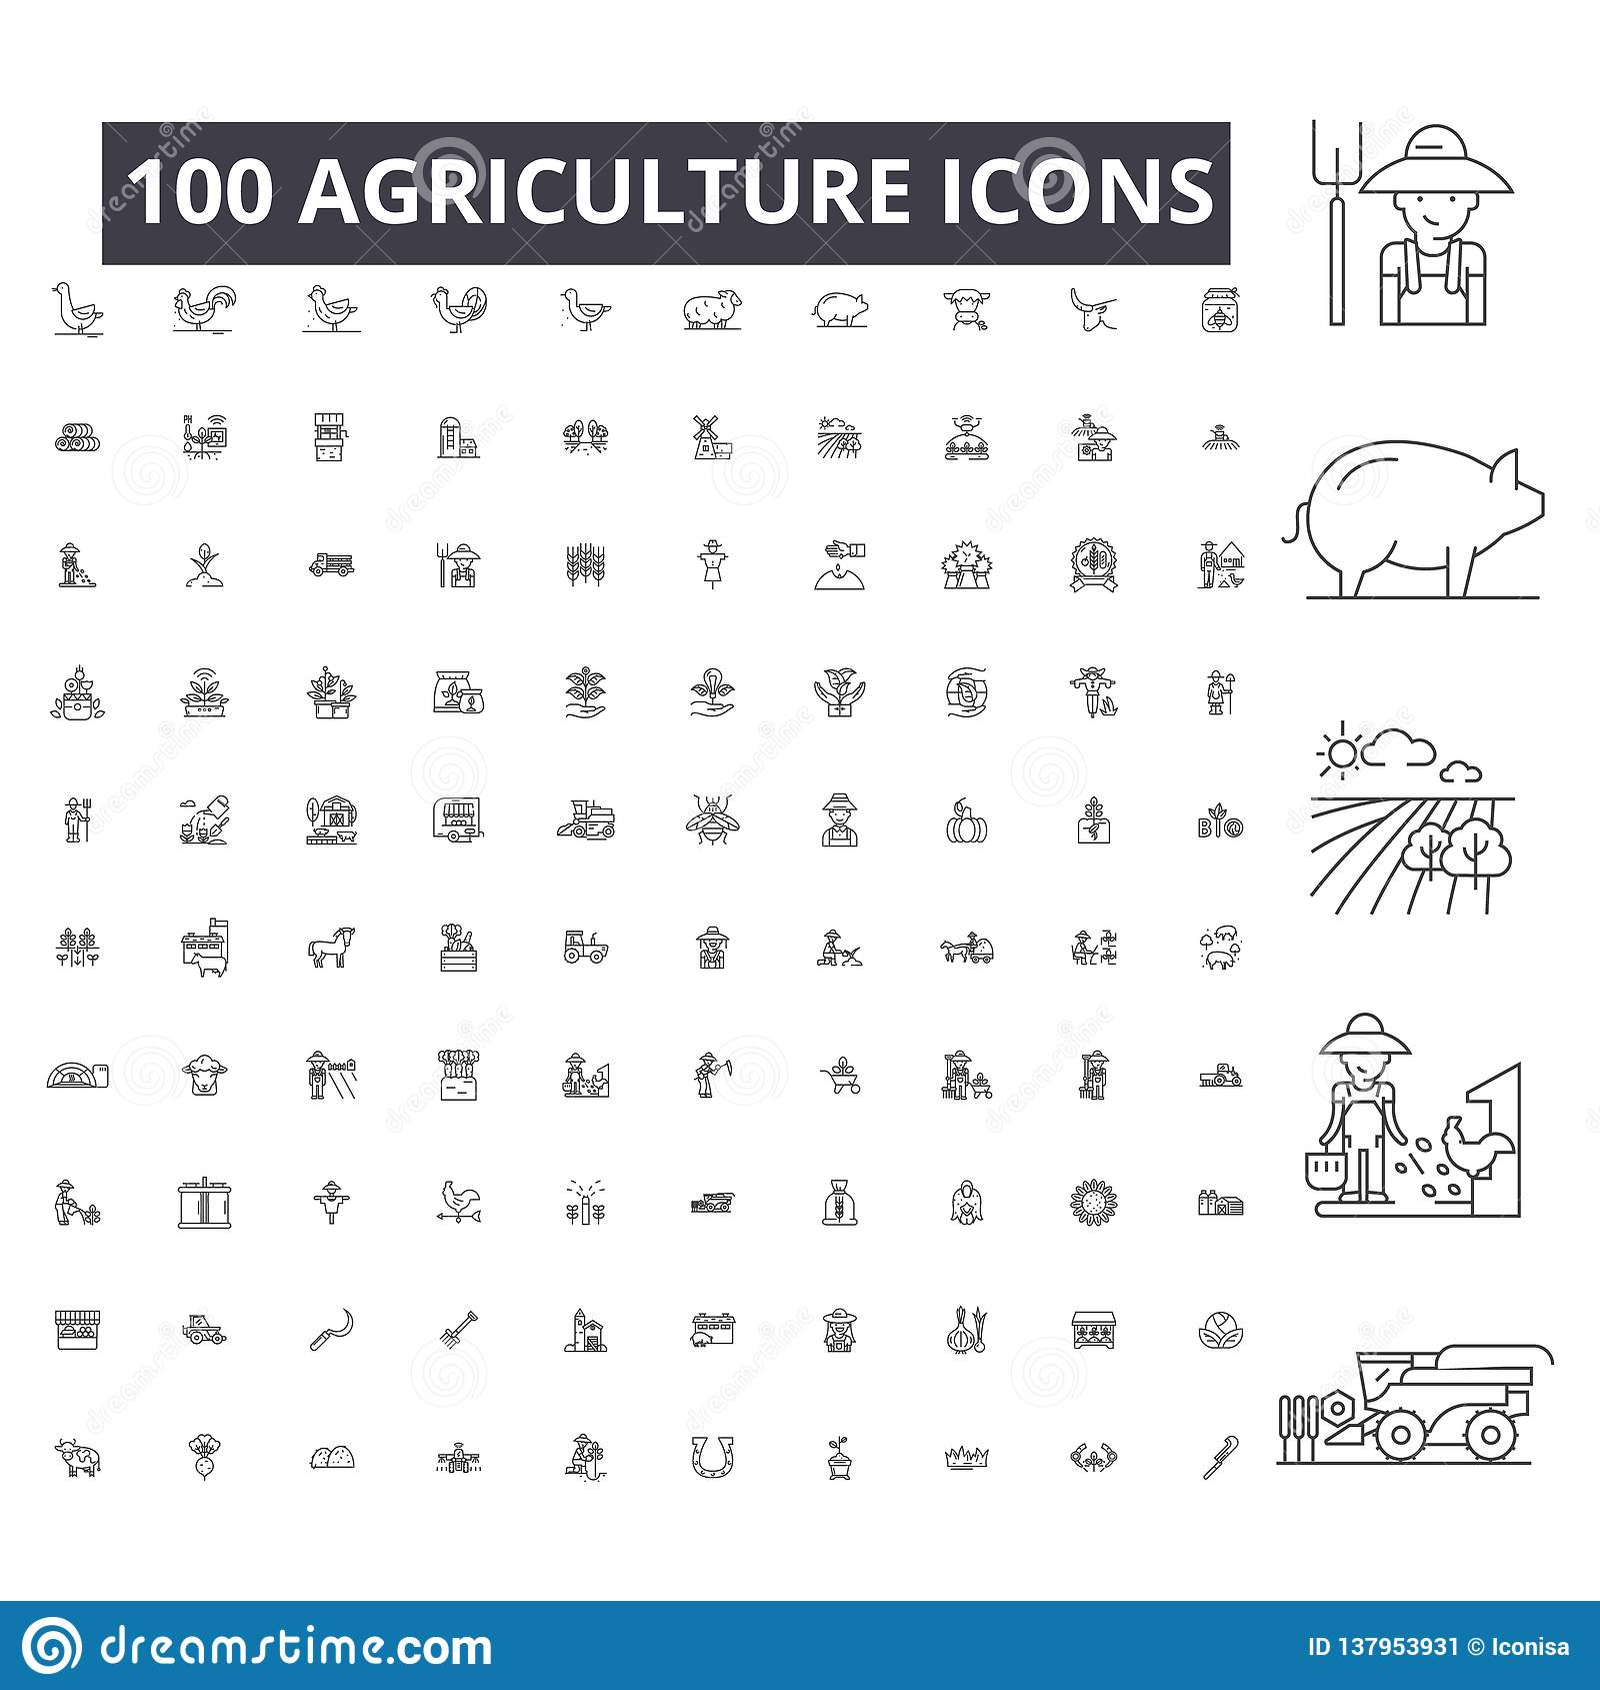 Editable εικονίδια γραμμών γεωργίας, διάνυσμα 100 που τίθεται στο άσπρο υπόβαθρο Μαύρες απεικονίσεις περιλήψεων γεωργίας, σημάδια